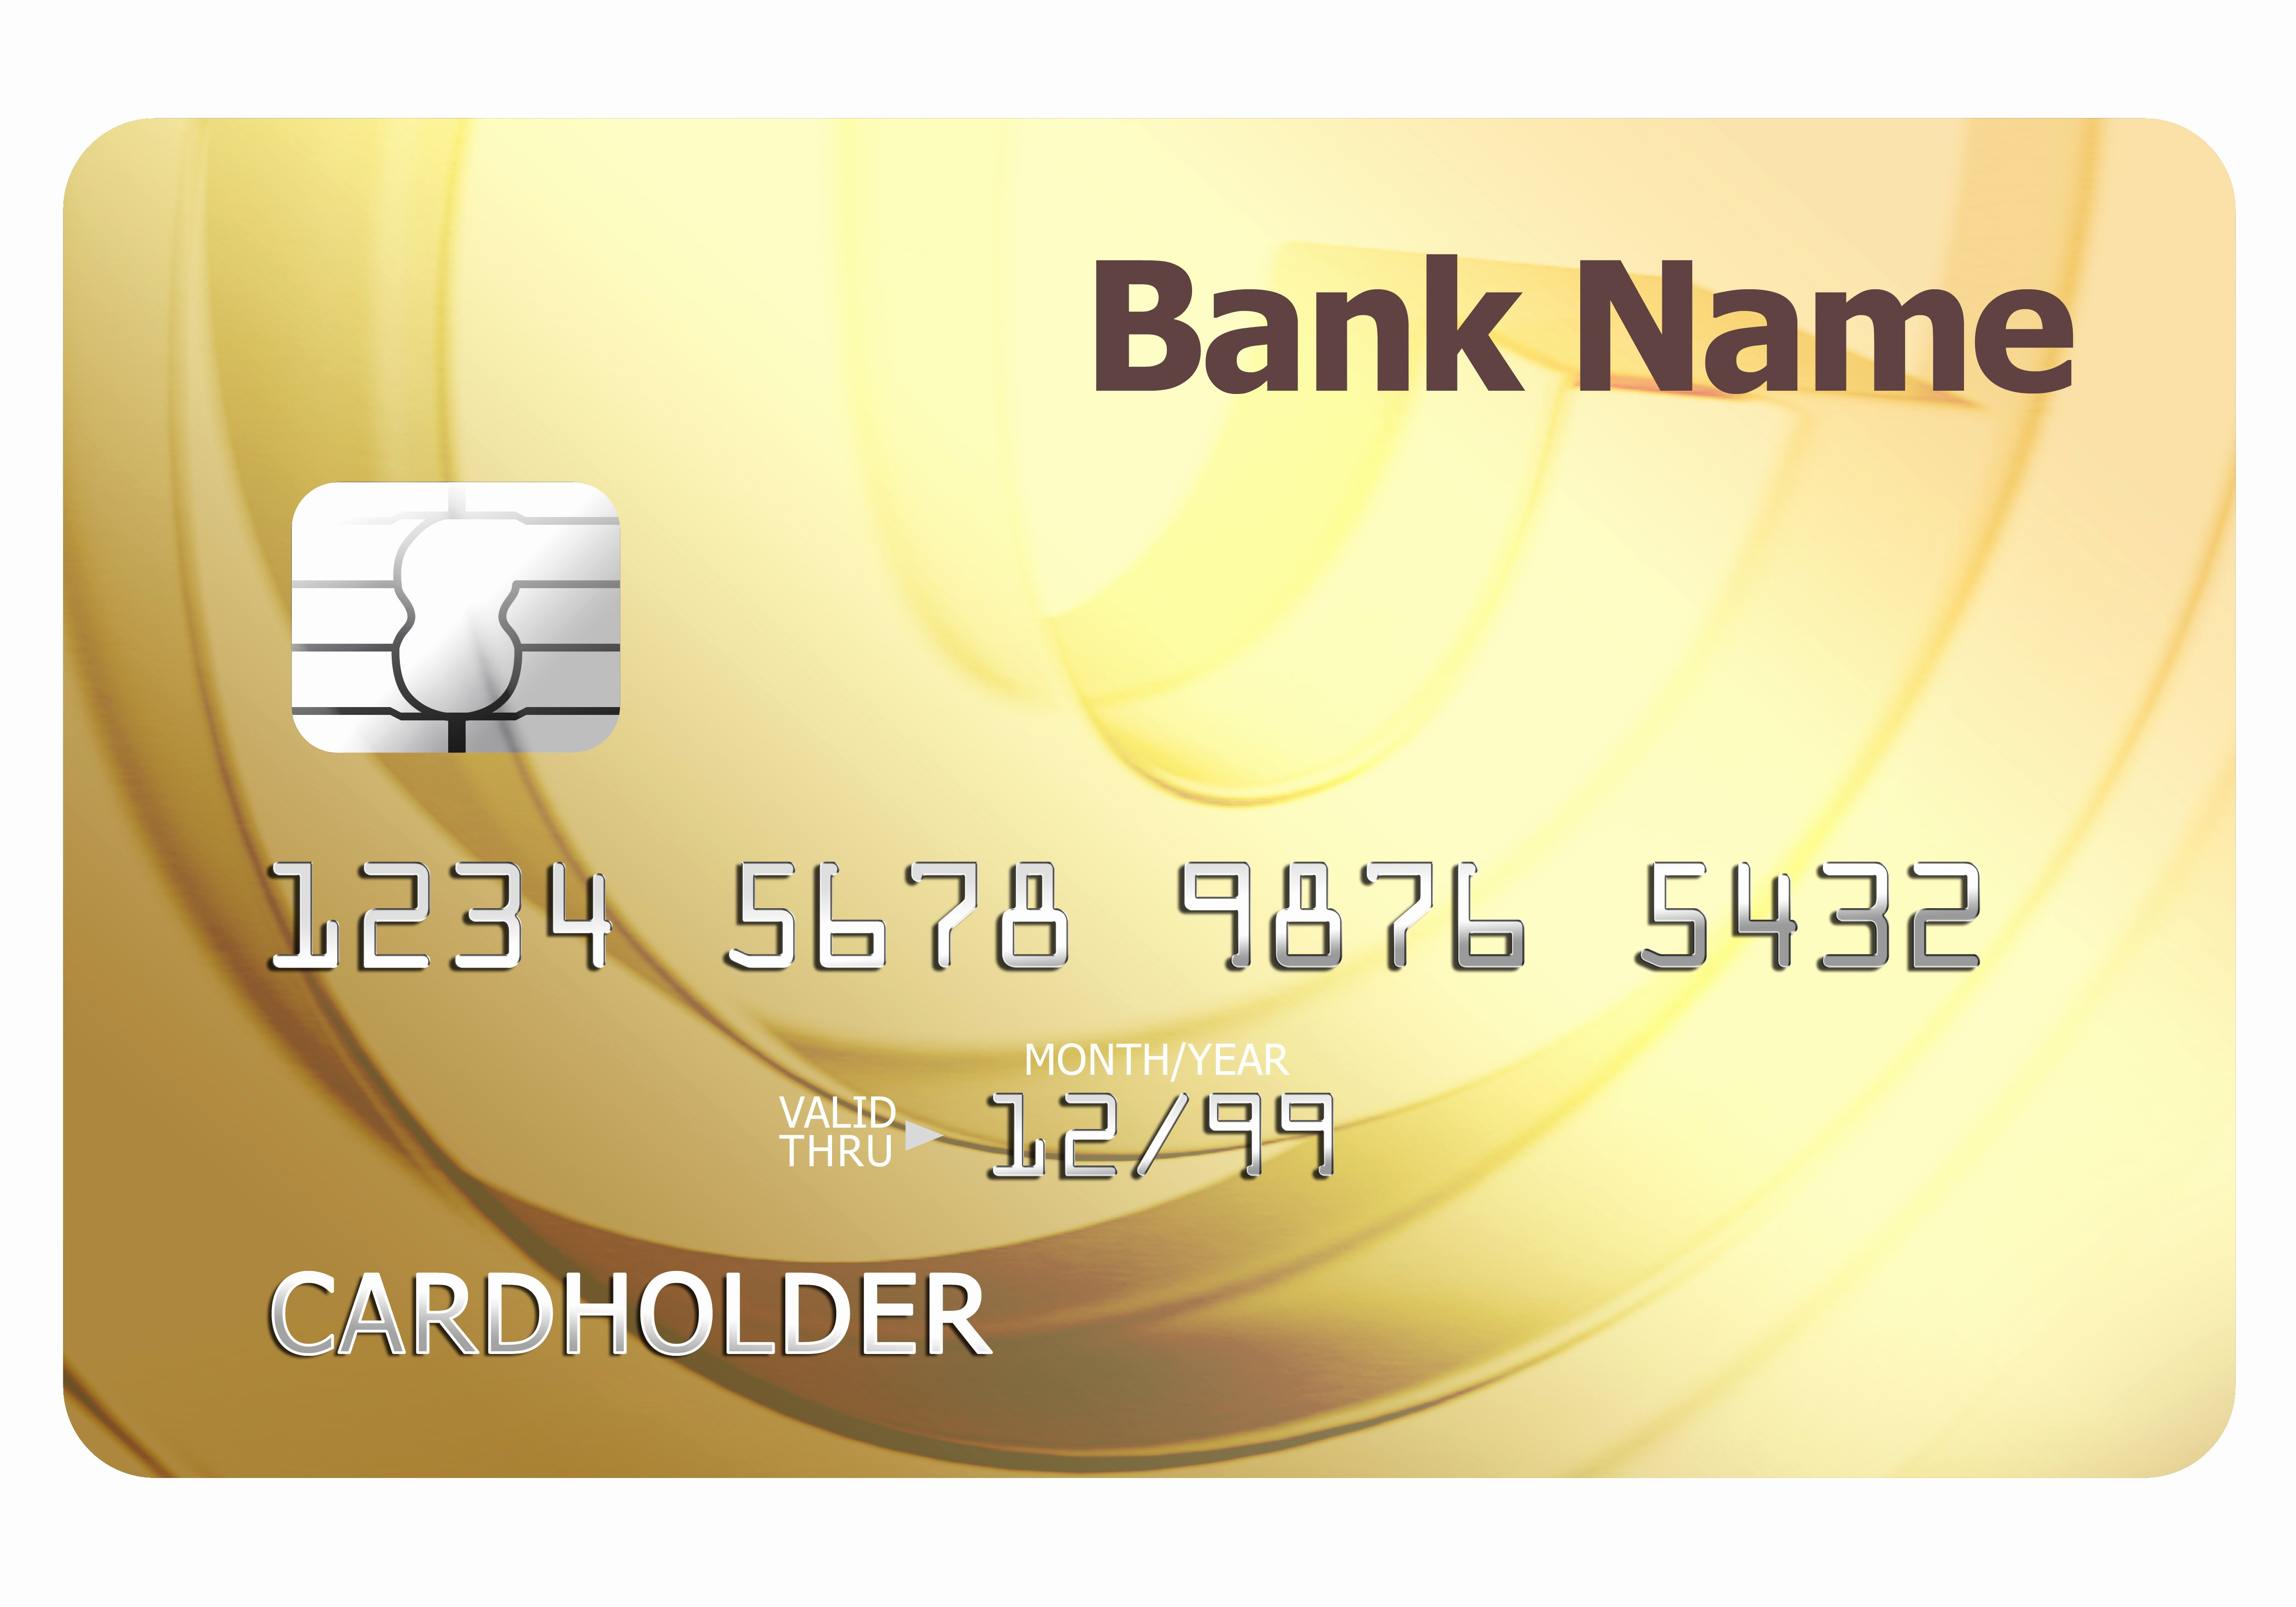 Blank Credit Card Template Elegant Credit Card Template